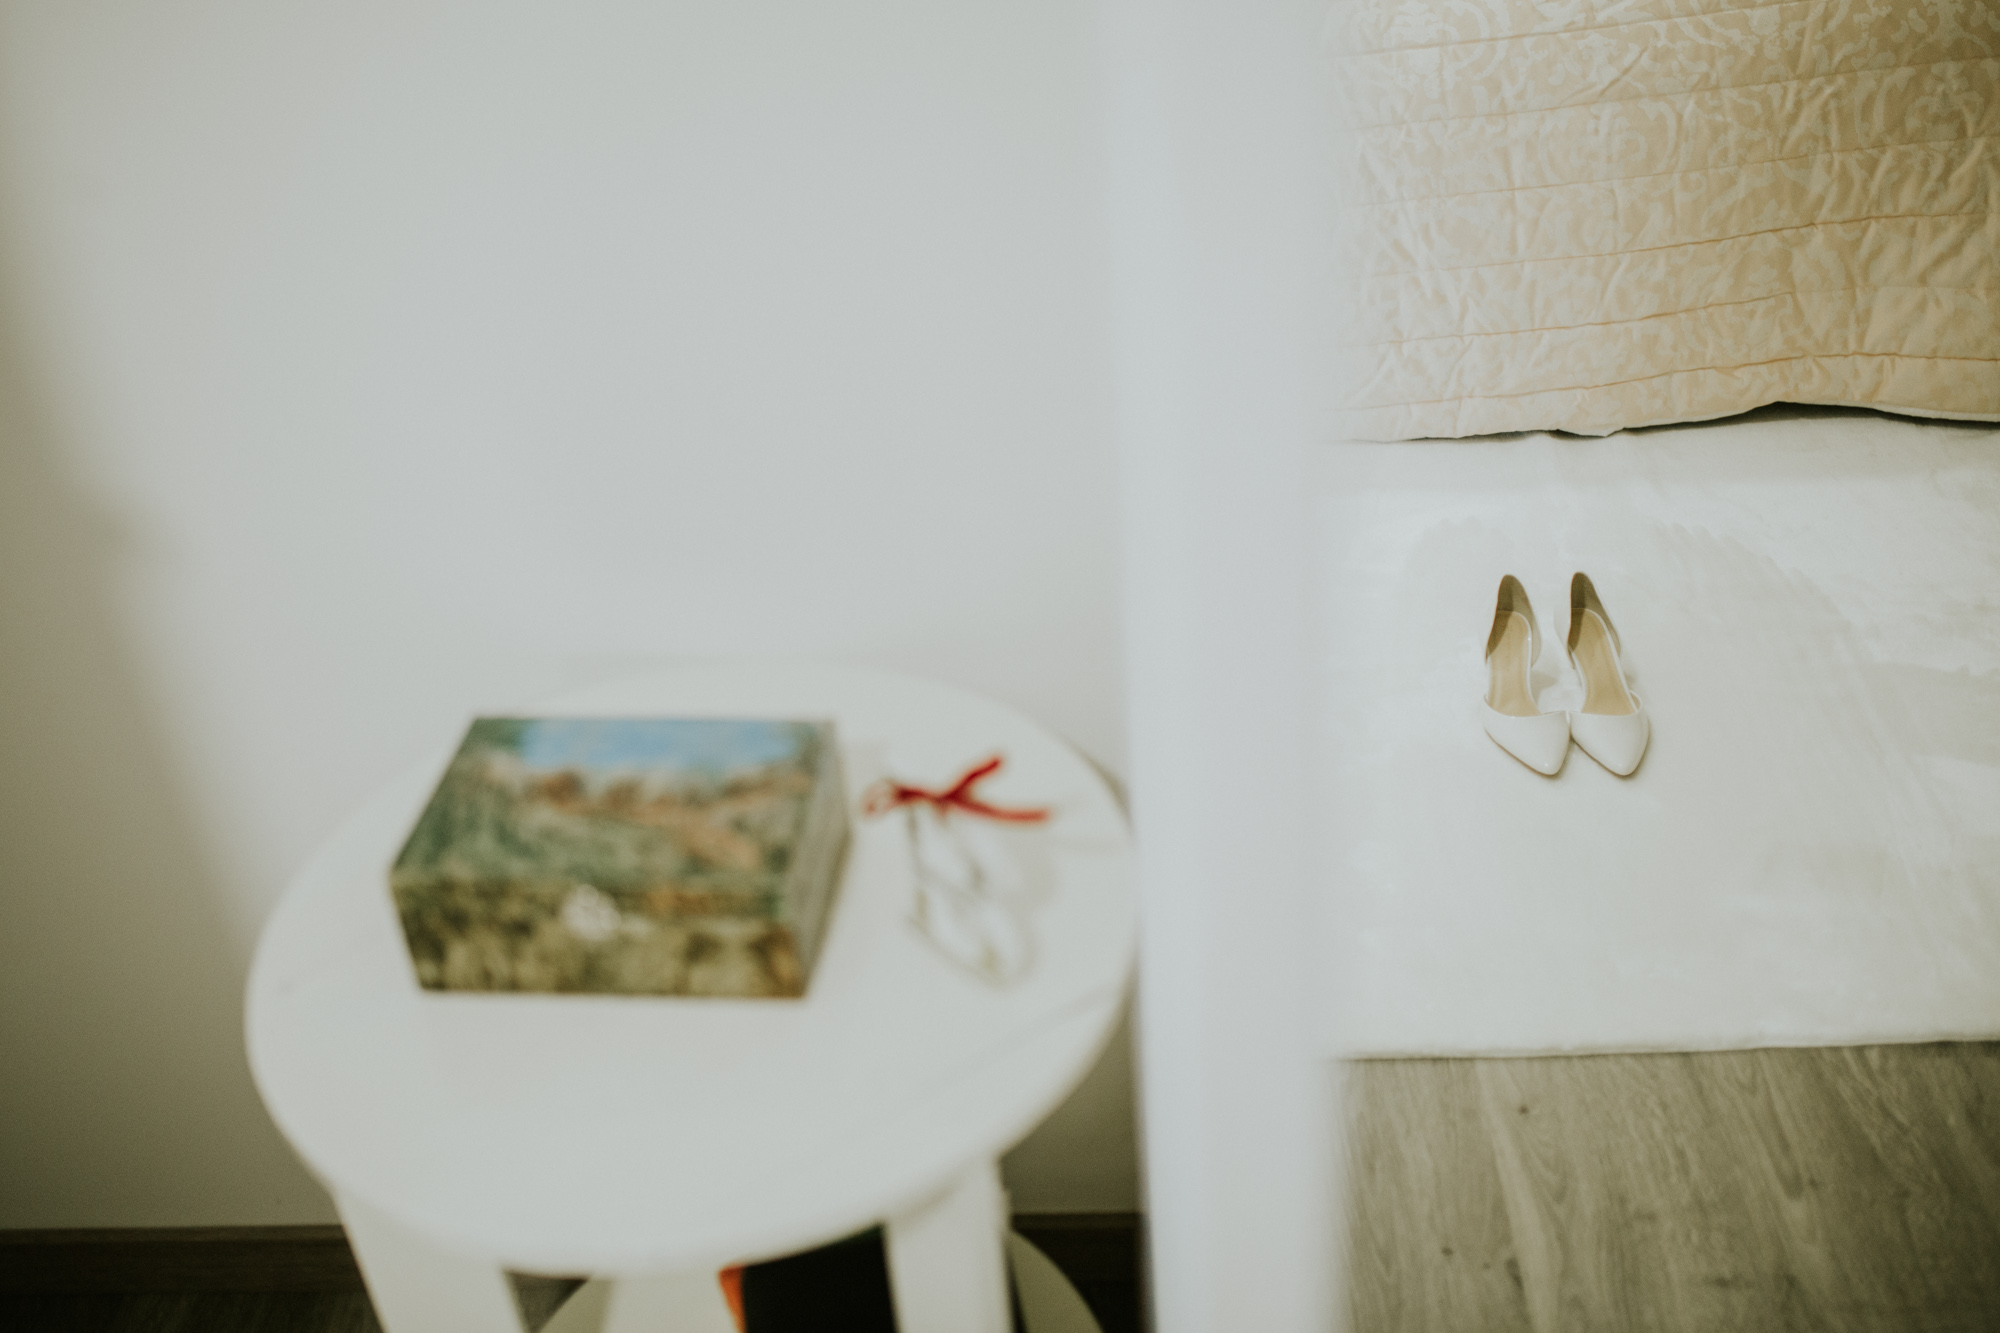 085-carina-e-samuel-wedding-casamento-quinta-dos-rouxinois-rustico-my-fancy-wedding-mafra-malveira-lisboa-sintra-cascais-filipe-santiago-fotografia-fotografo-lifestyle-destination-portugal